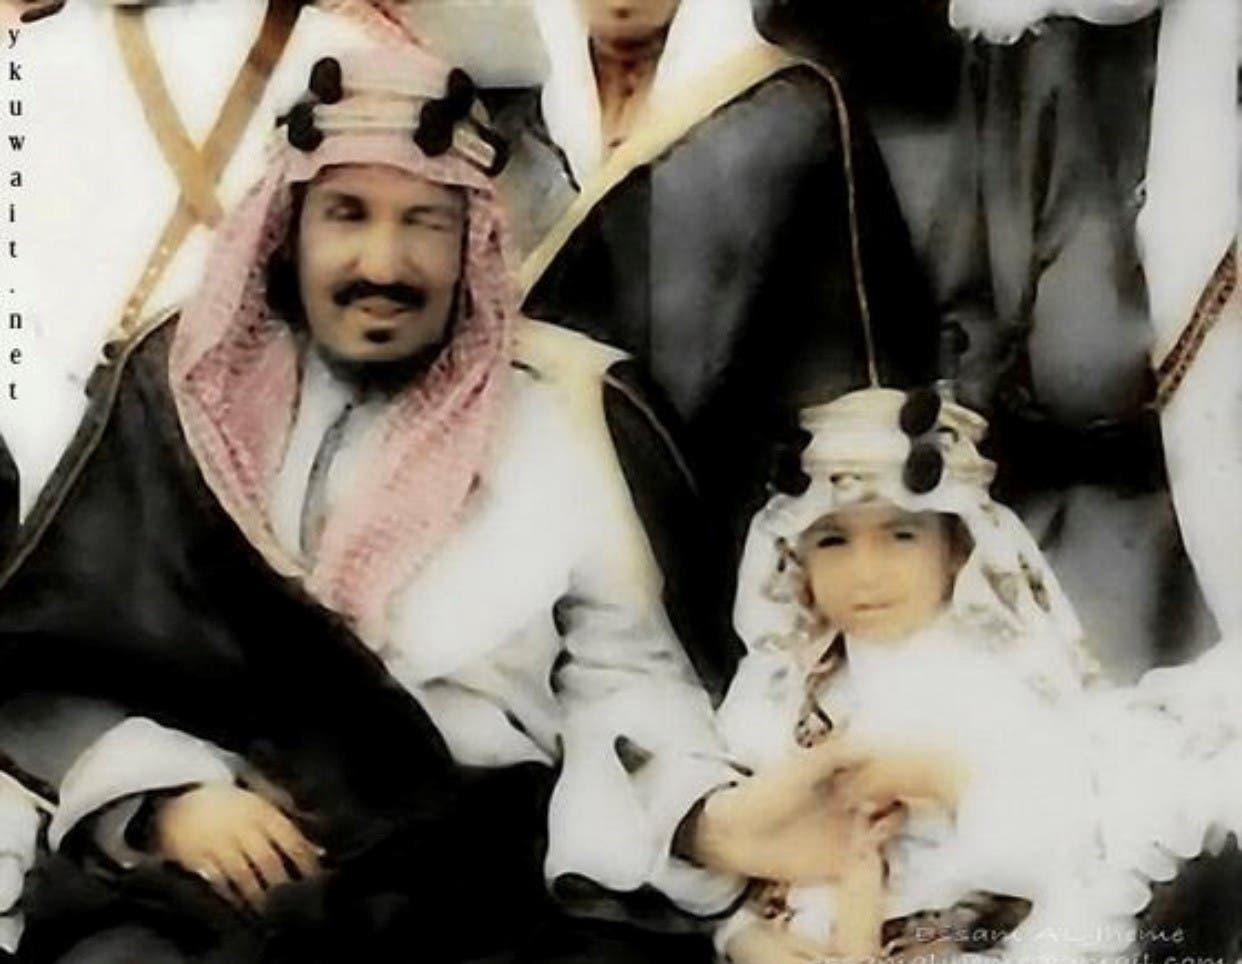 King Abdulaziz supplied